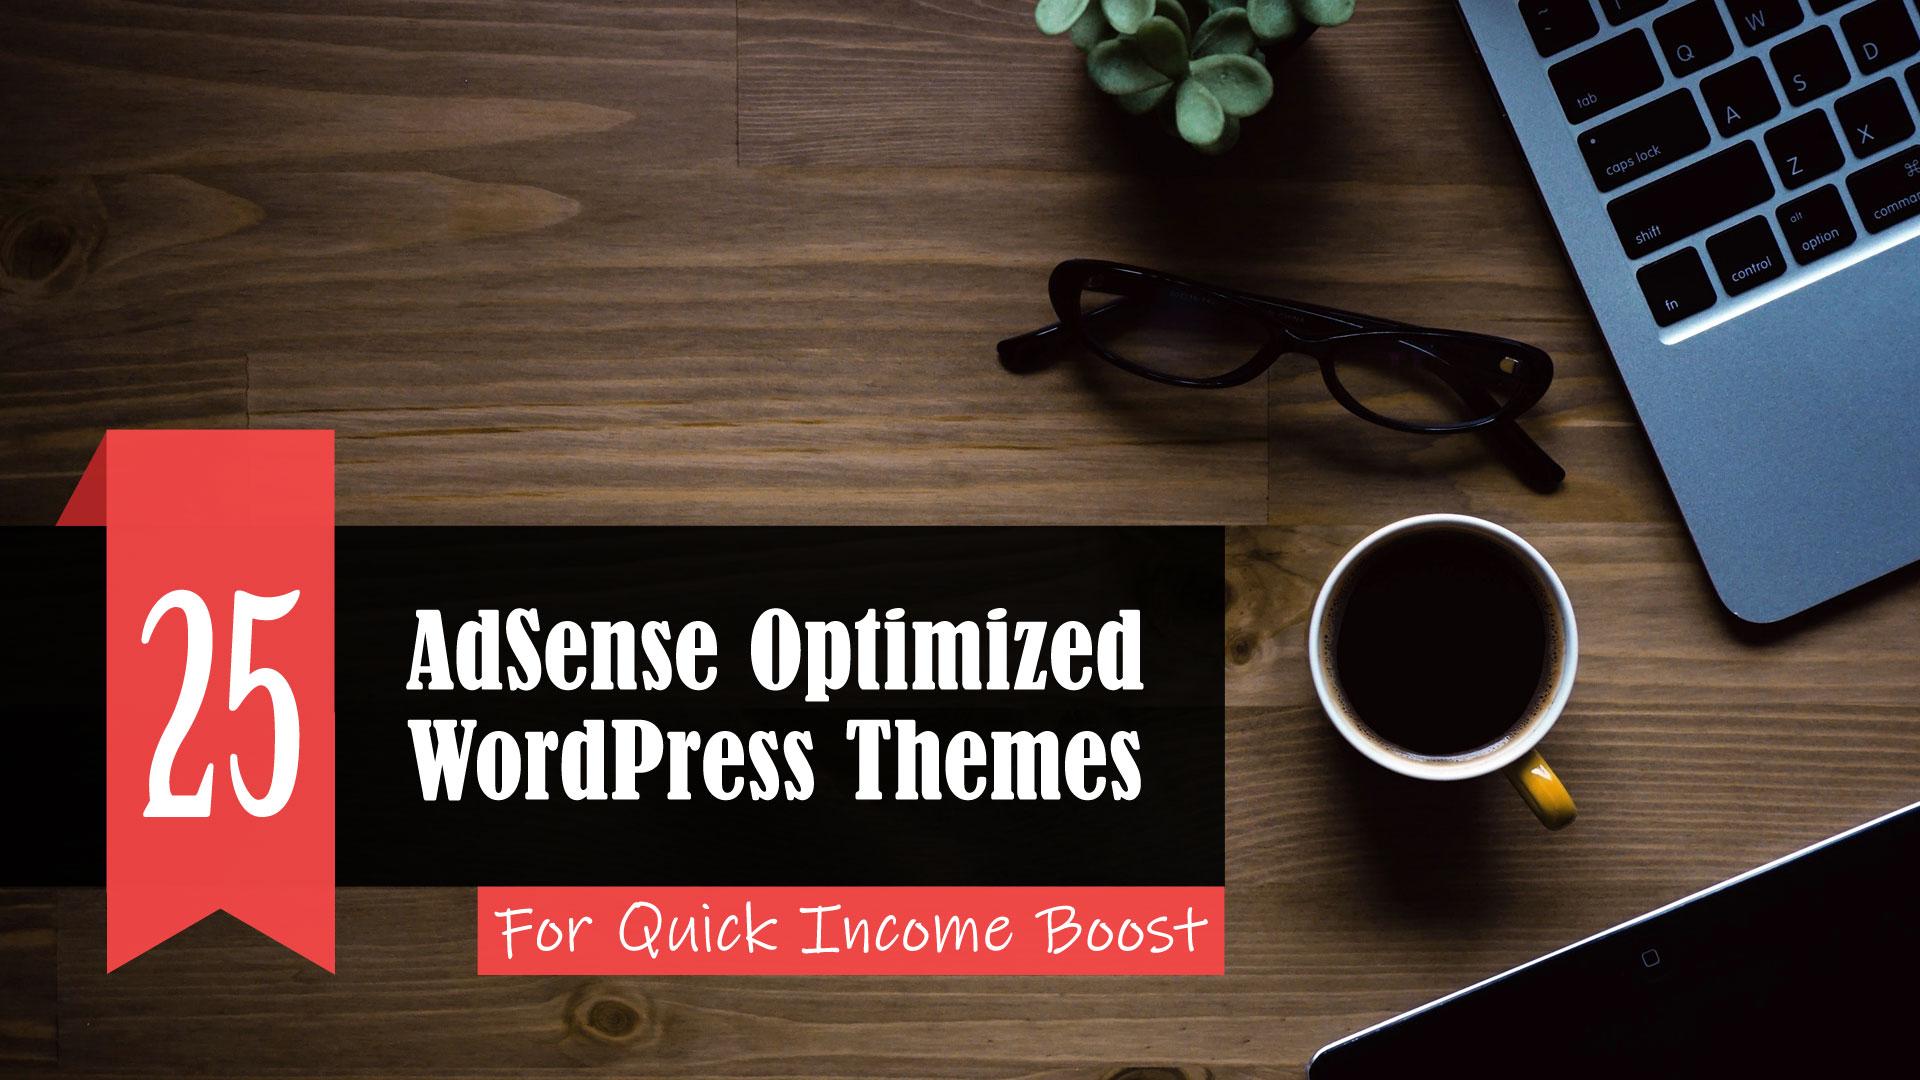 25 Best AdSense Optimized WordPress Themes - AtulHost